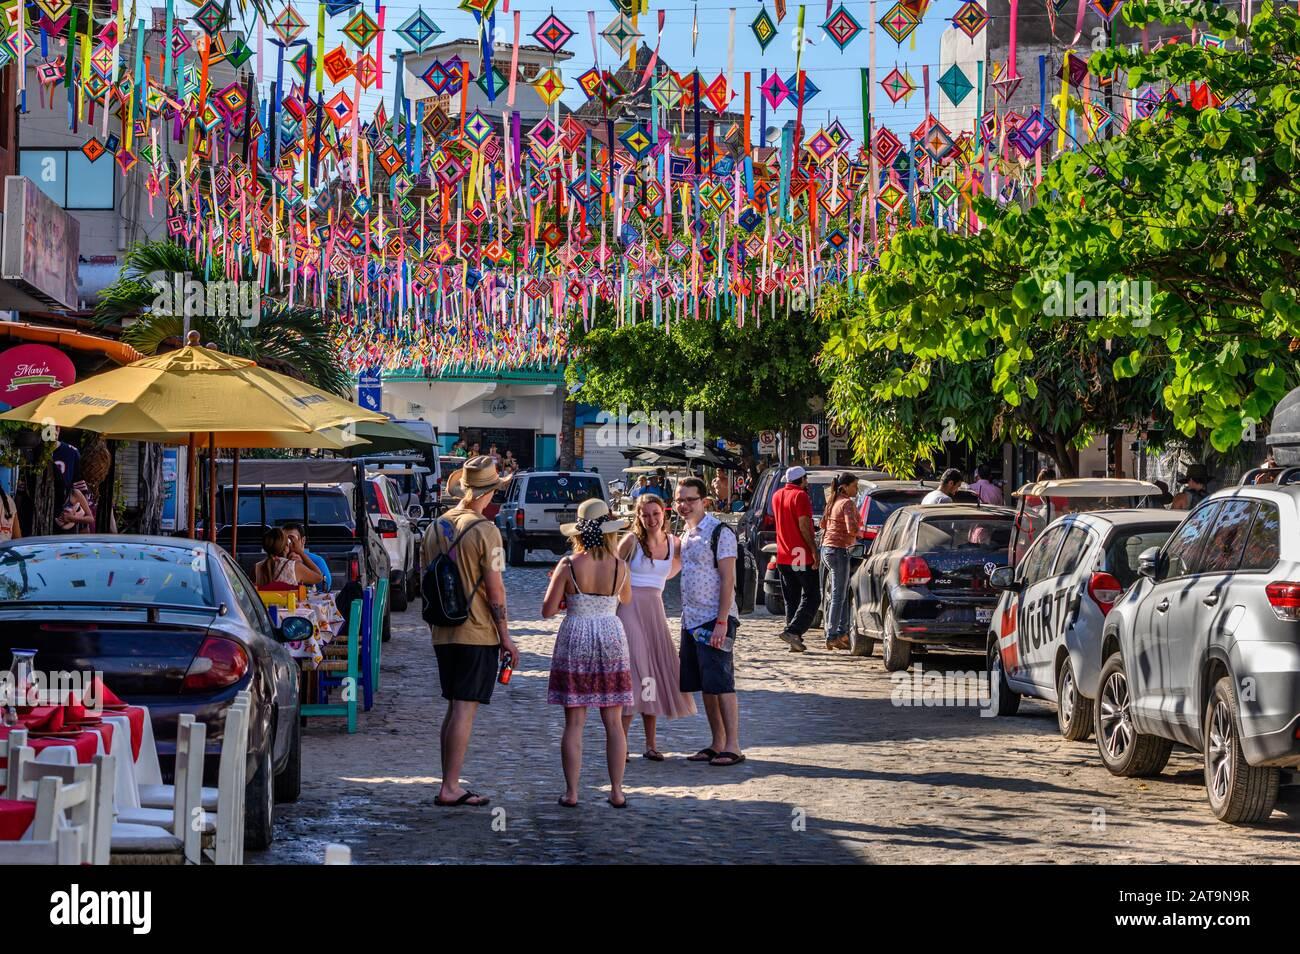 Besucher, die Selfies in Sayulita, Riviera Nayarit, Mexiko einnehmen. Stockfoto